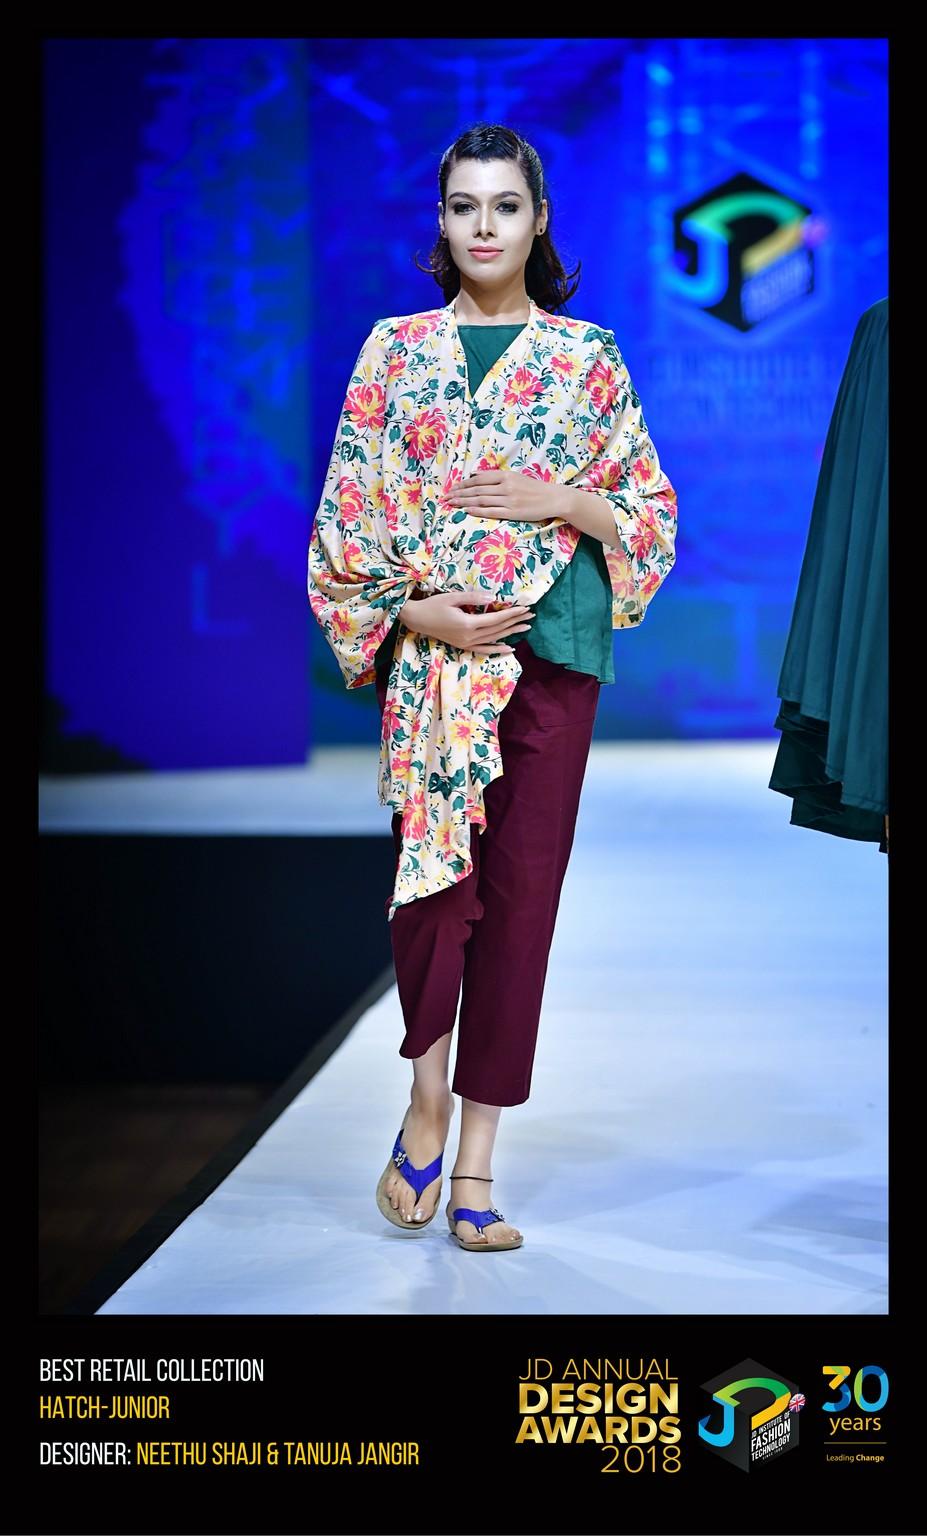 Hatch: Junior on Board – Change – JD Annual Design Awards 2018 | Designer: Neethu Shaji and Tanuja Jangir | Photography : Jerin Nath (@jerin_nath) hatch Hatch: Junior on Board – Change – JD Annual Design Awards 2018 HATCH JUNIOR4